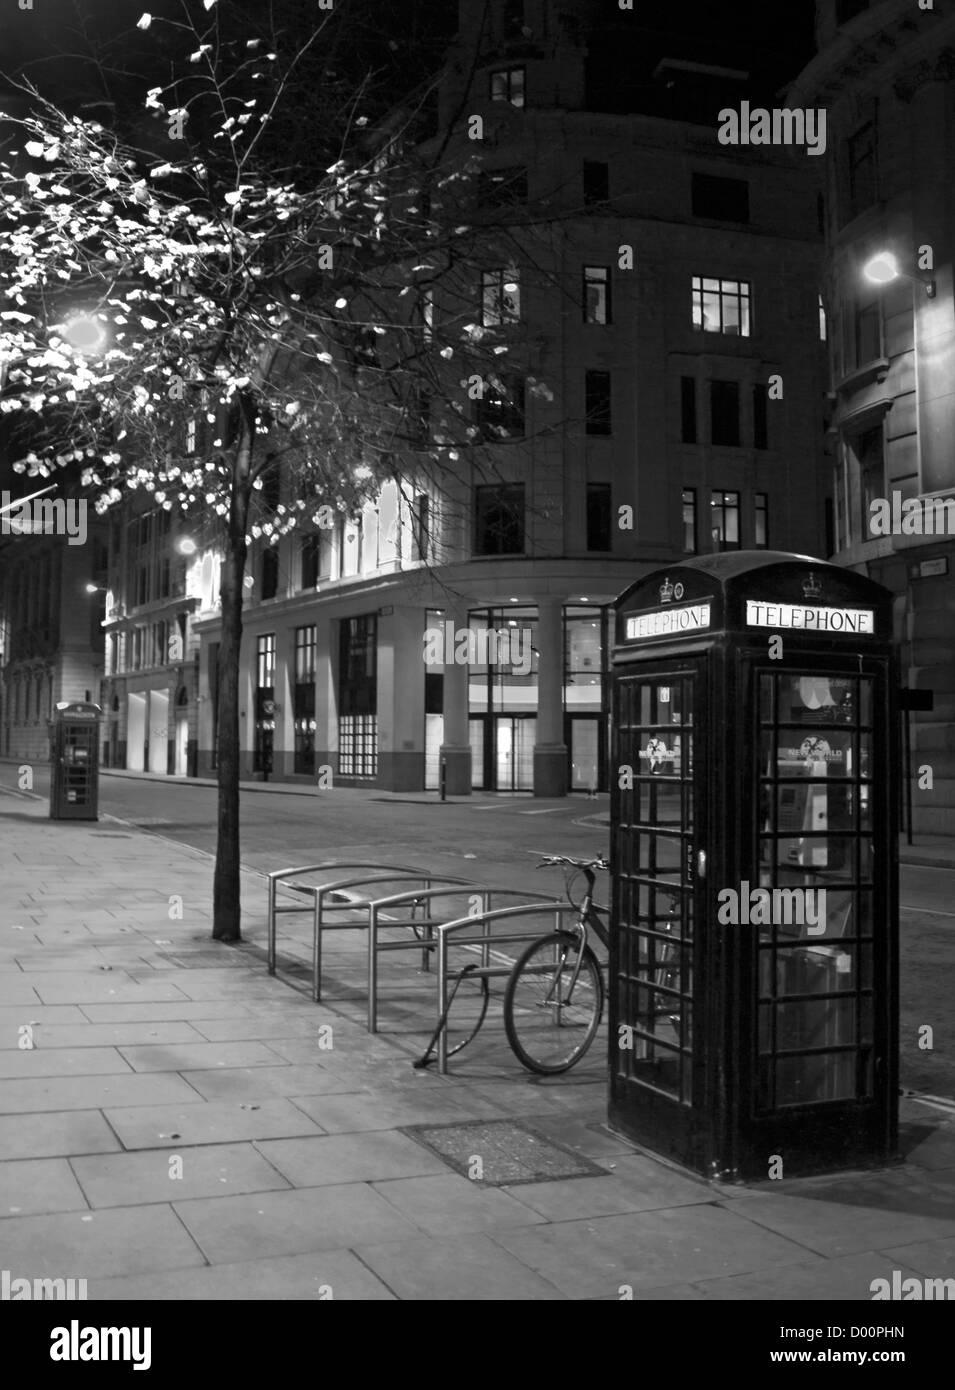 Central London at night showing iconic telephone boxes, London, England, United Kingdom - Stock Image